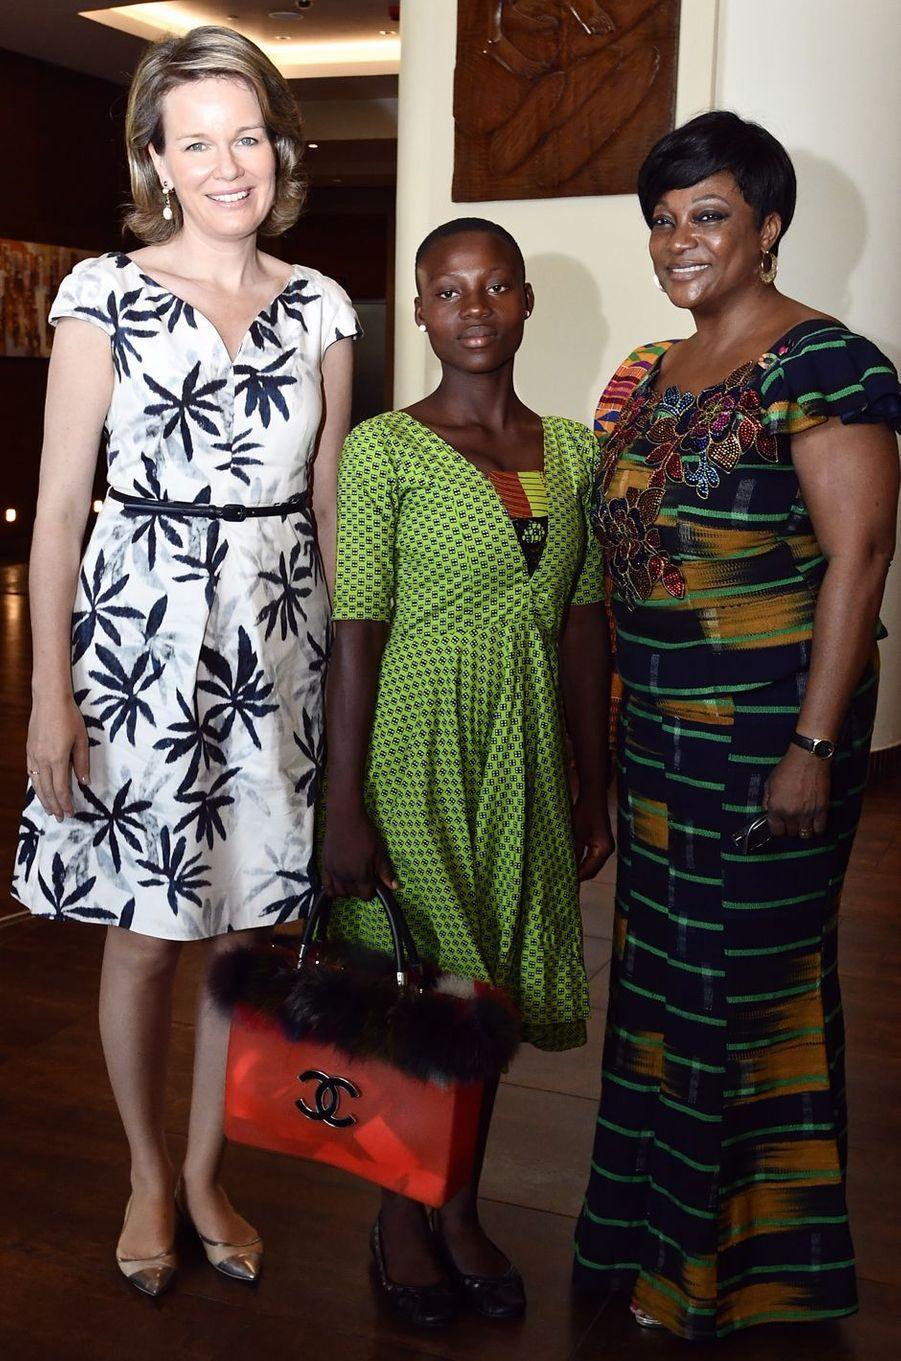 La reine des Belges Mathilde au Ghana, en Natan, le 8 février 2018